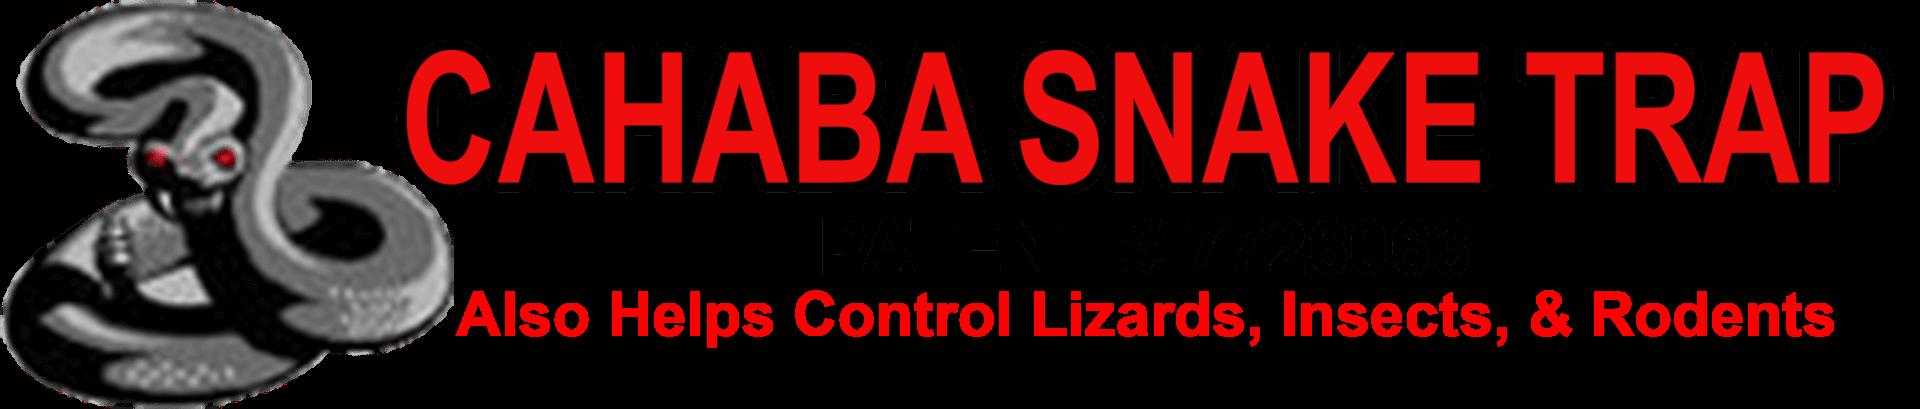 Snake Trap | Vestavia Hills, AL – Cahaba Snake Trap